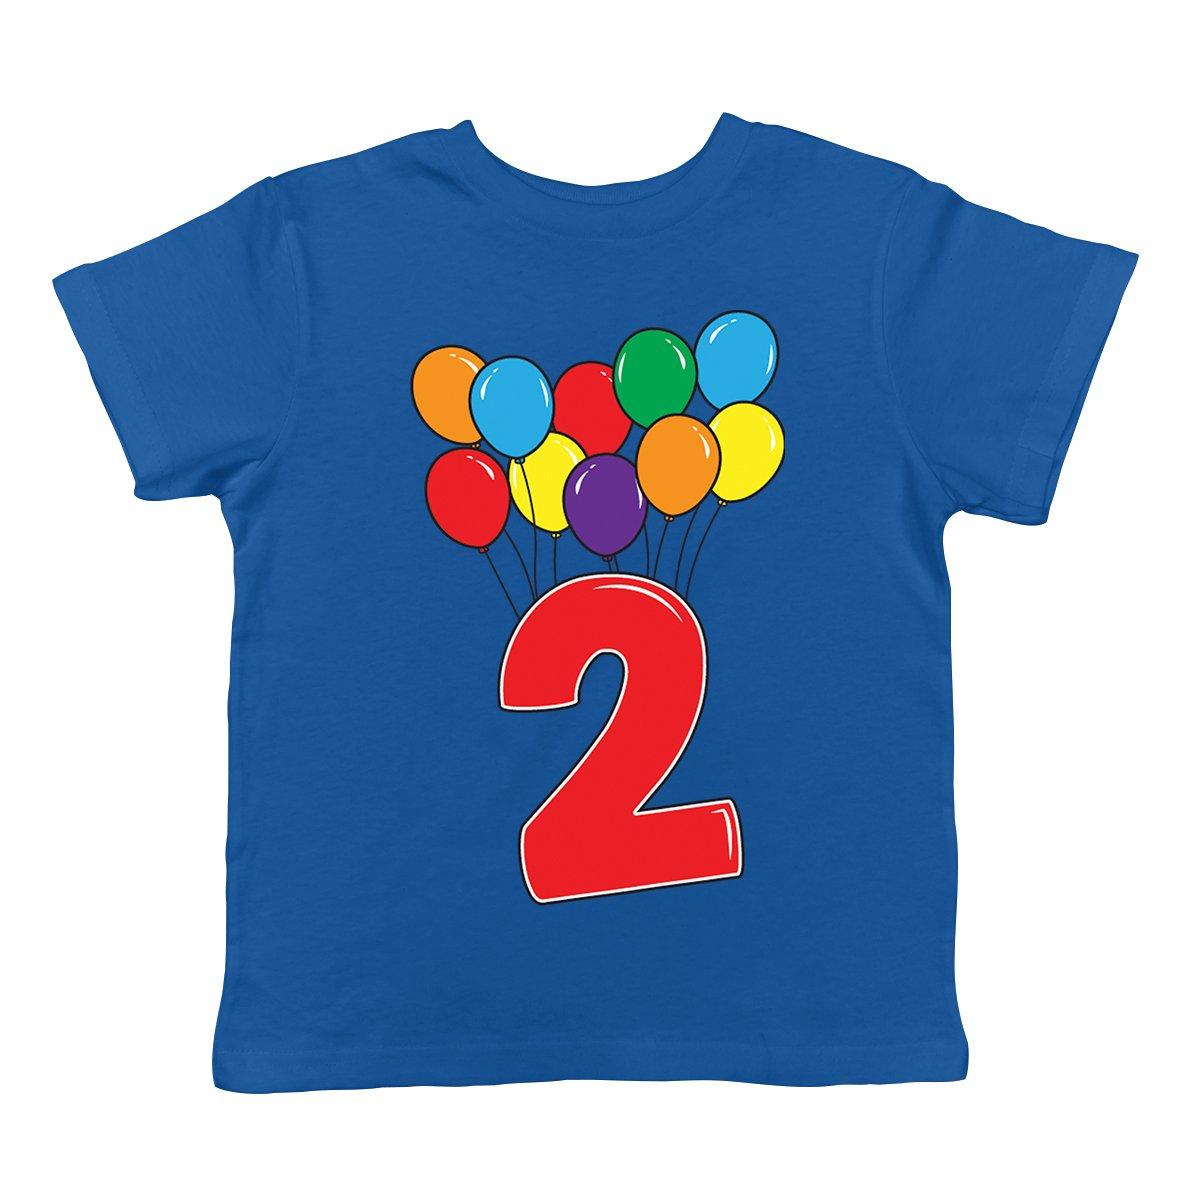 2 Year Old Birthday Balloons Infant T Shirt SpiritForged Apparel Royal 24 Months